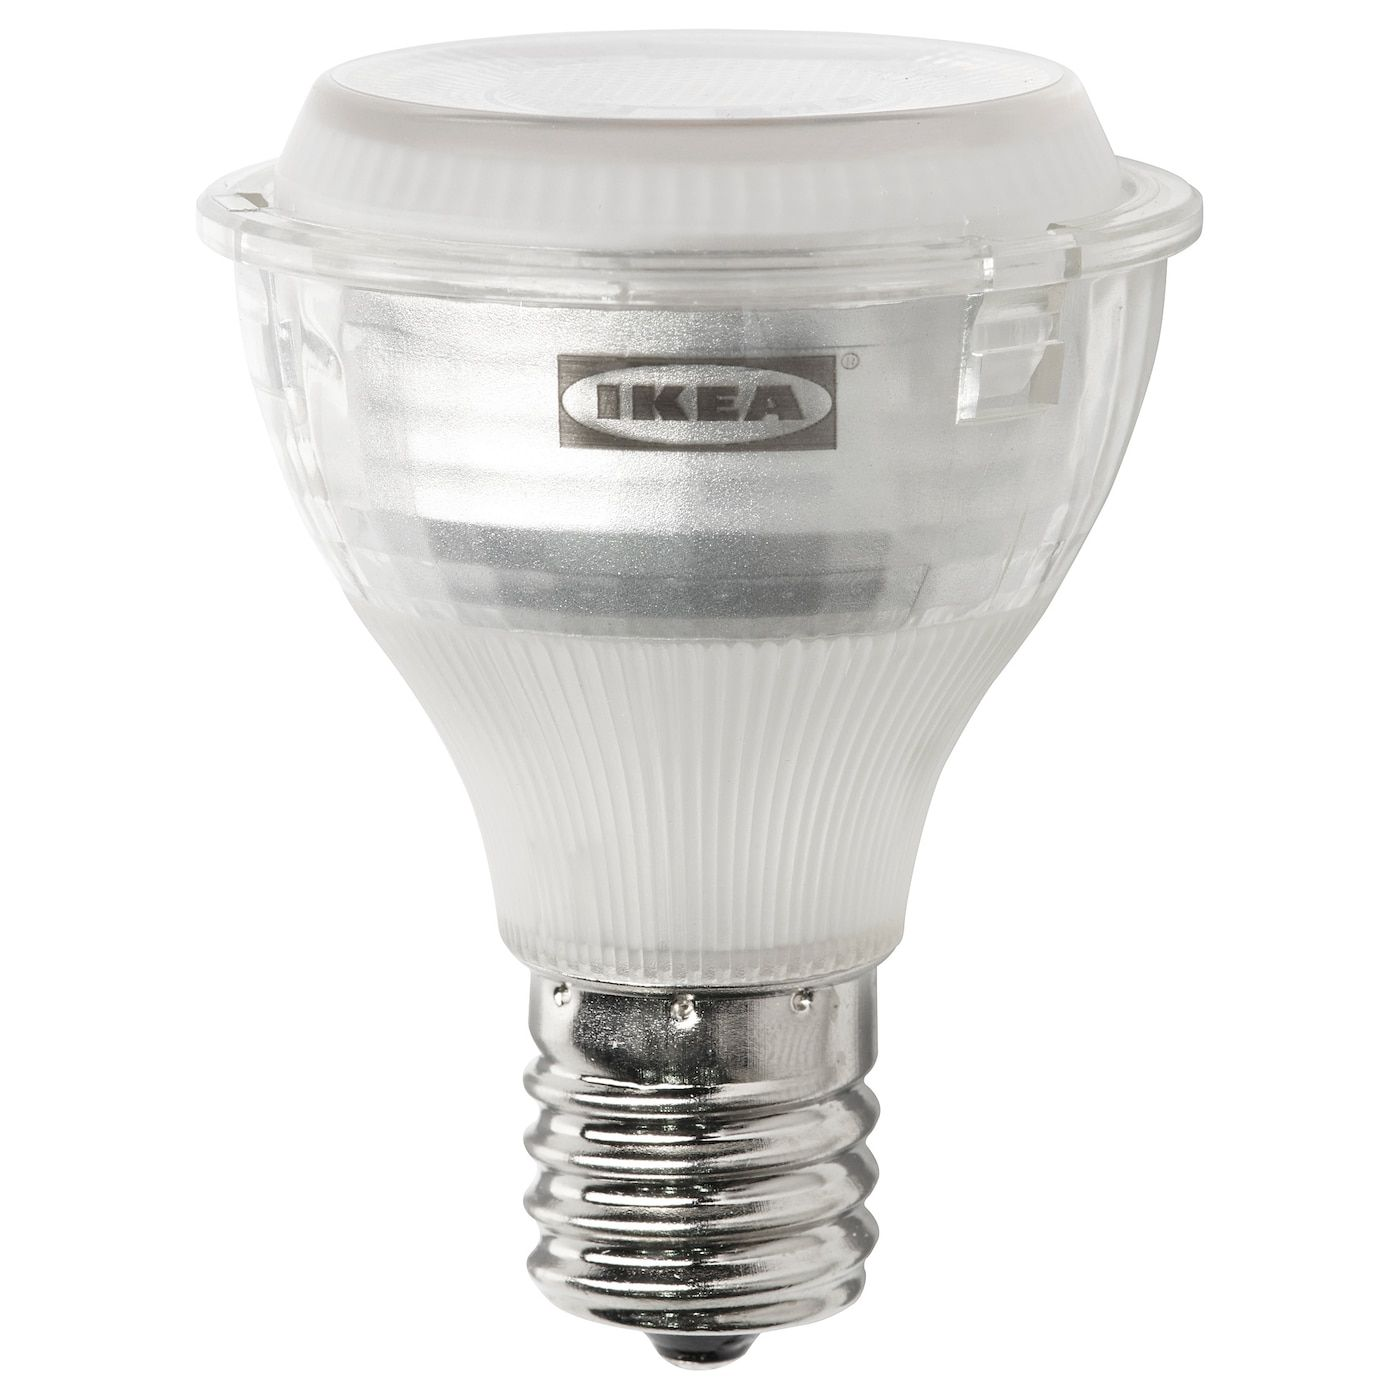 LEDARE LED bulb E17 reflector R14 400 lm dimmable warm